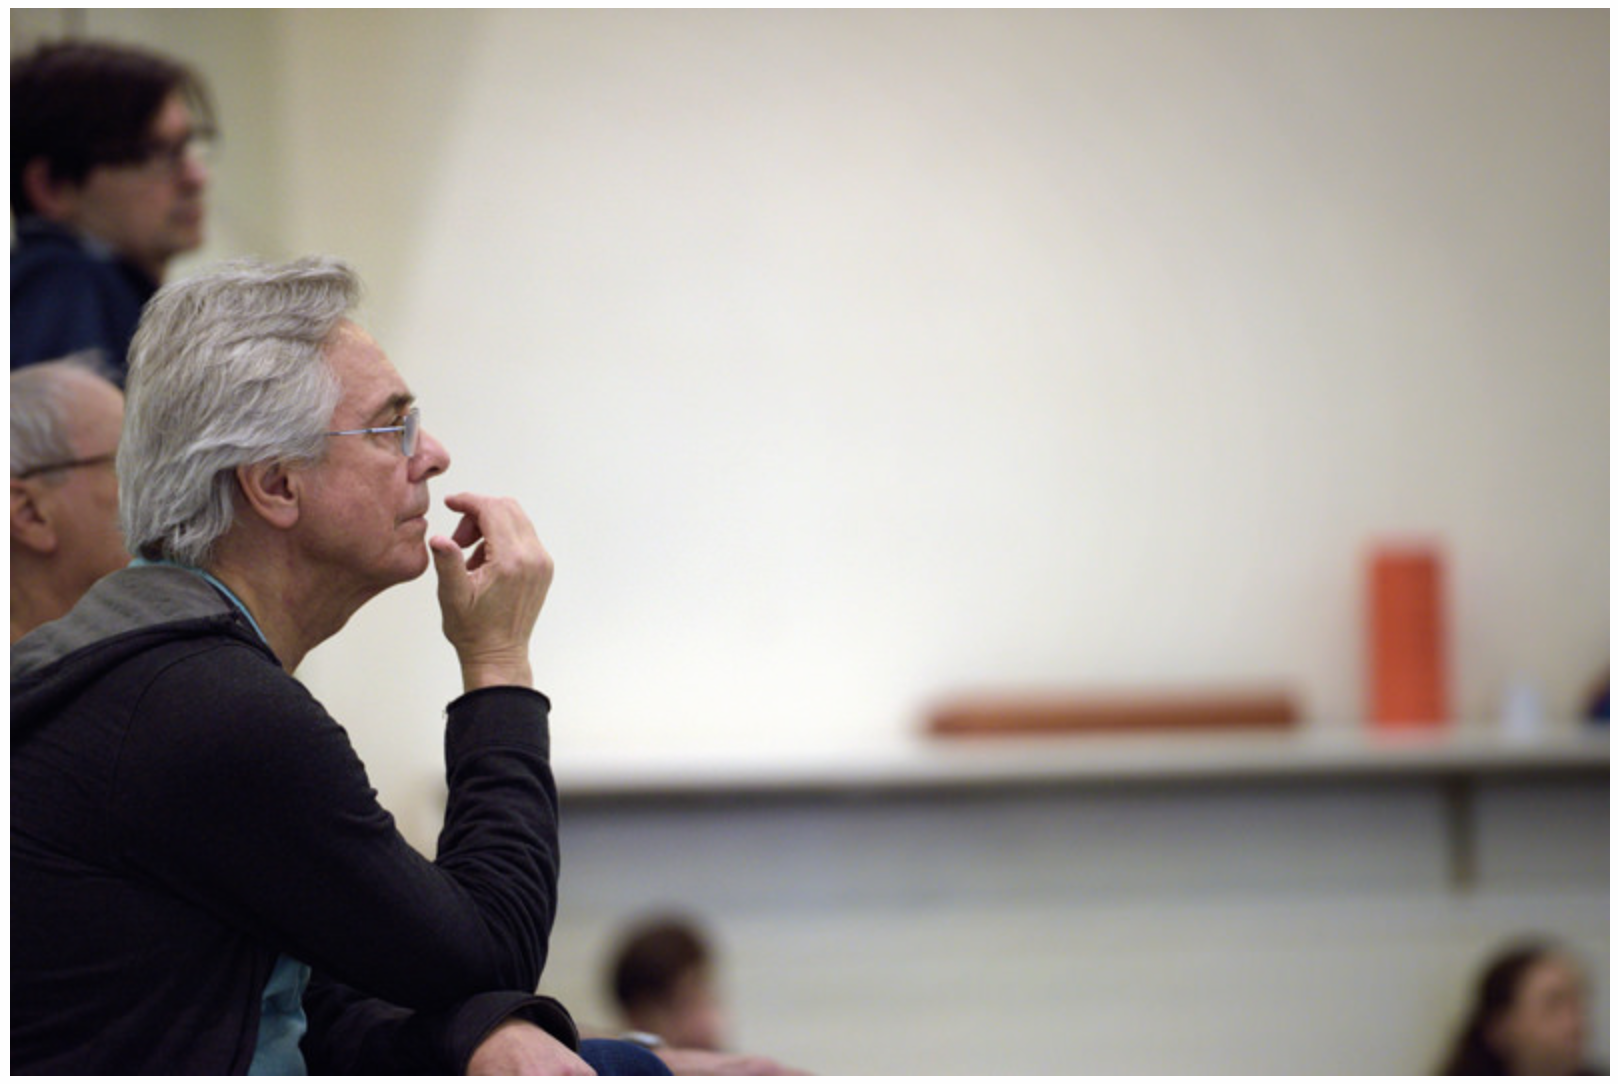 John Neumeier rehearsing with English National Ballet in the studio.   Photo Credit: Laurent Liotardo Photography   Original Link: http://www.flickr.com/photos/englishnationalballet/16764418065/in/photostream/